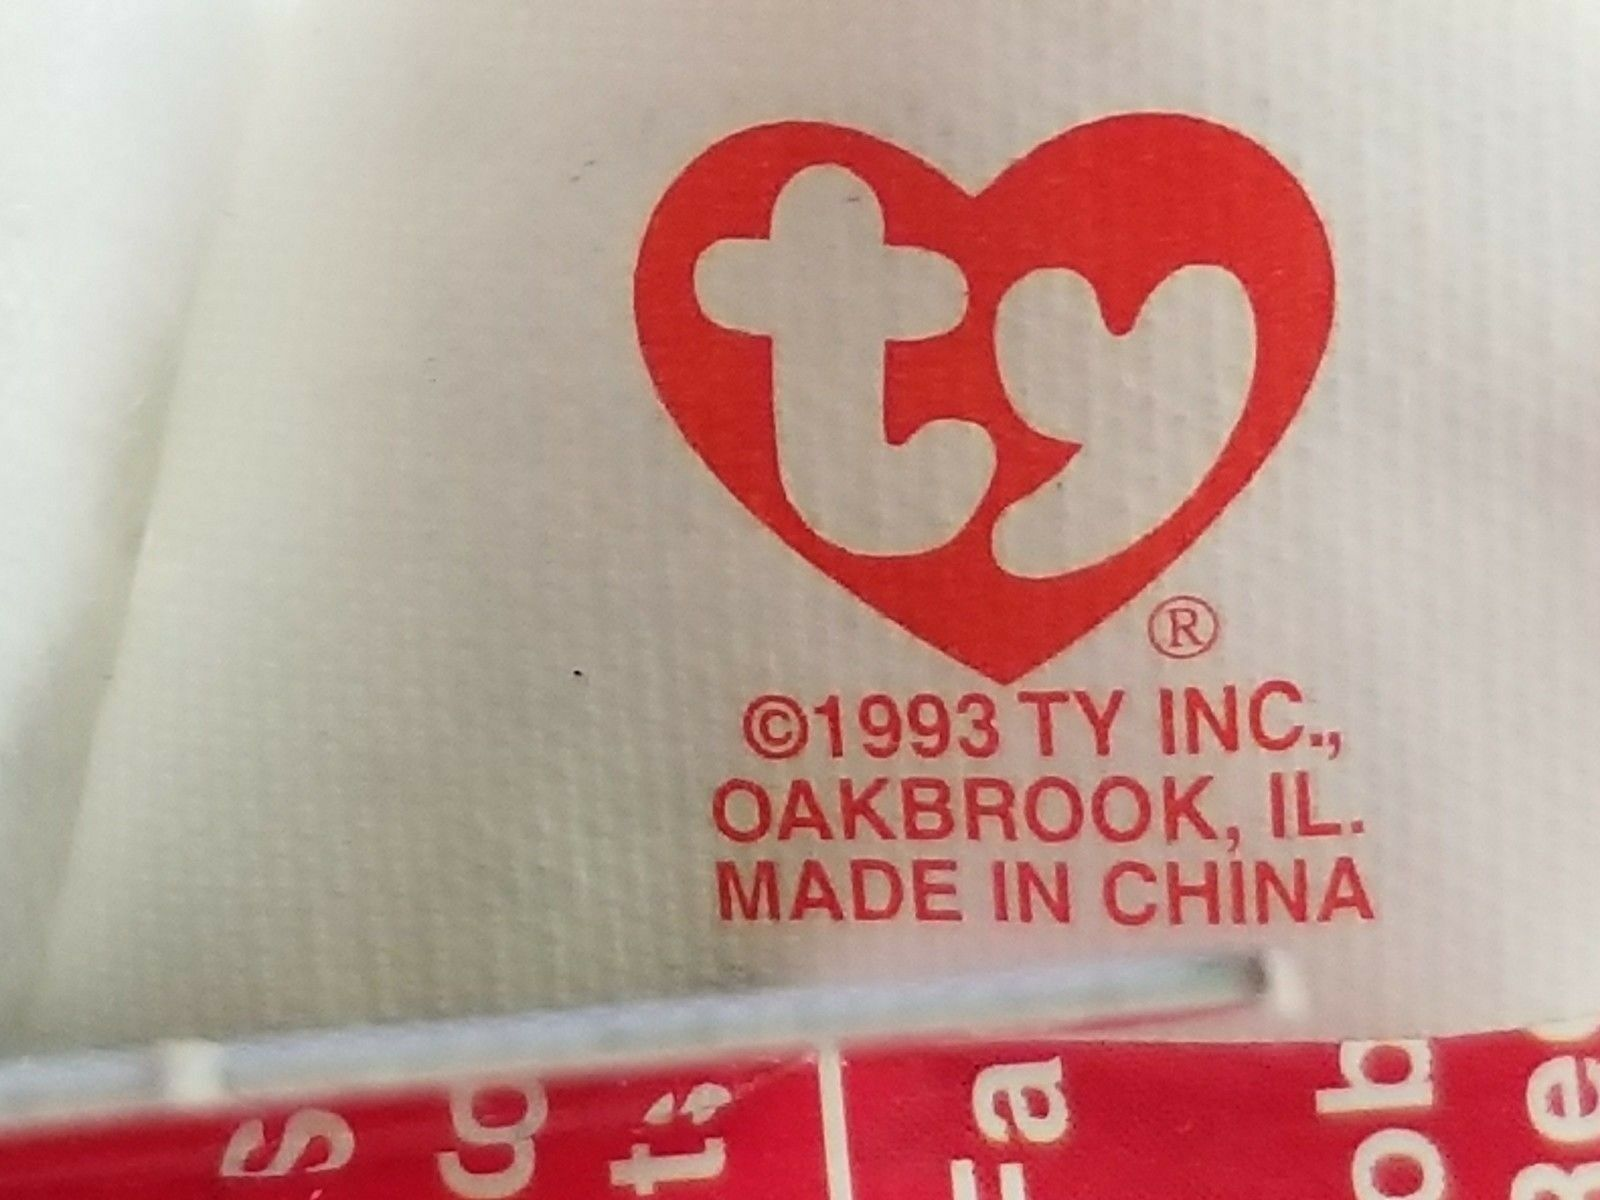 BeanTY toys hobbies   beanbag plush     TY   Beanie Babies originals   retired 238d24